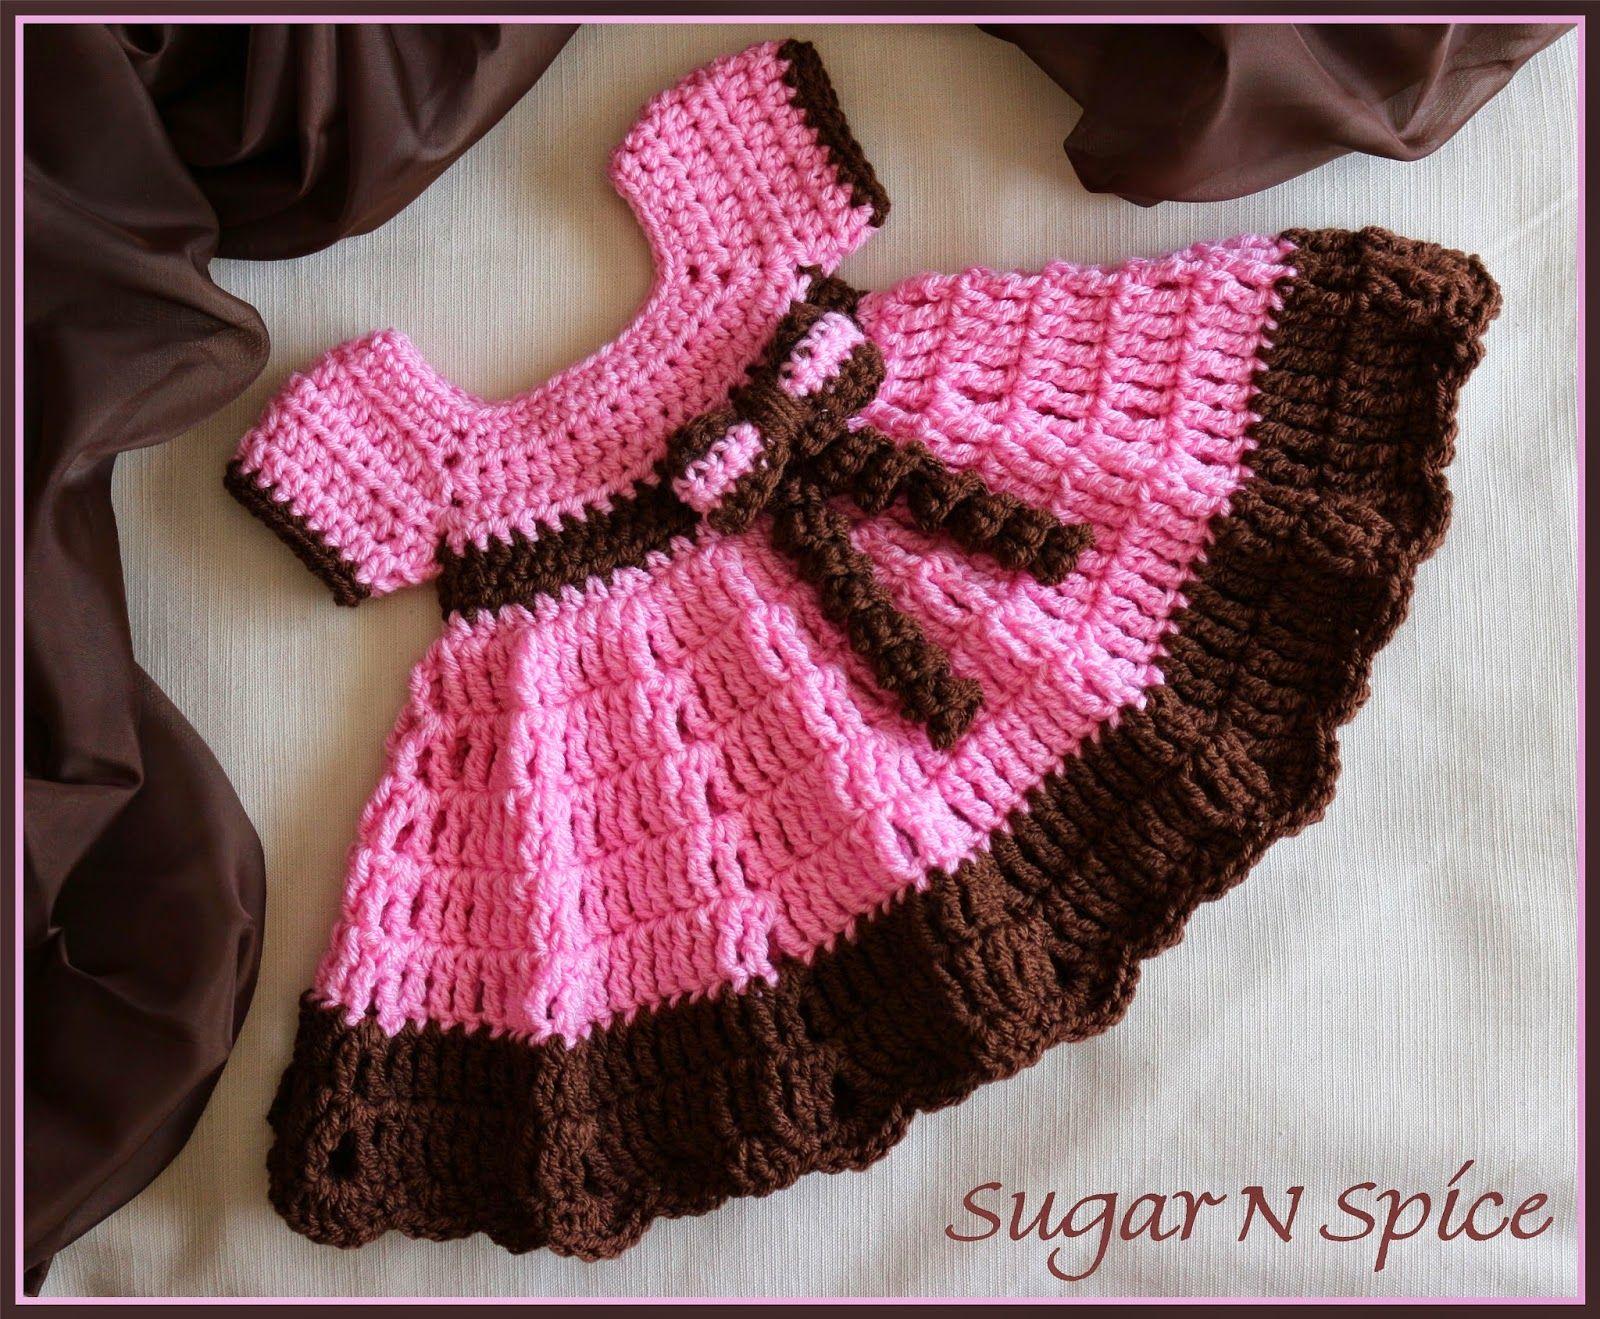 Crochet Supernova: Sugar N Spice Dress ~FREE PATTERN~ | hand made ...